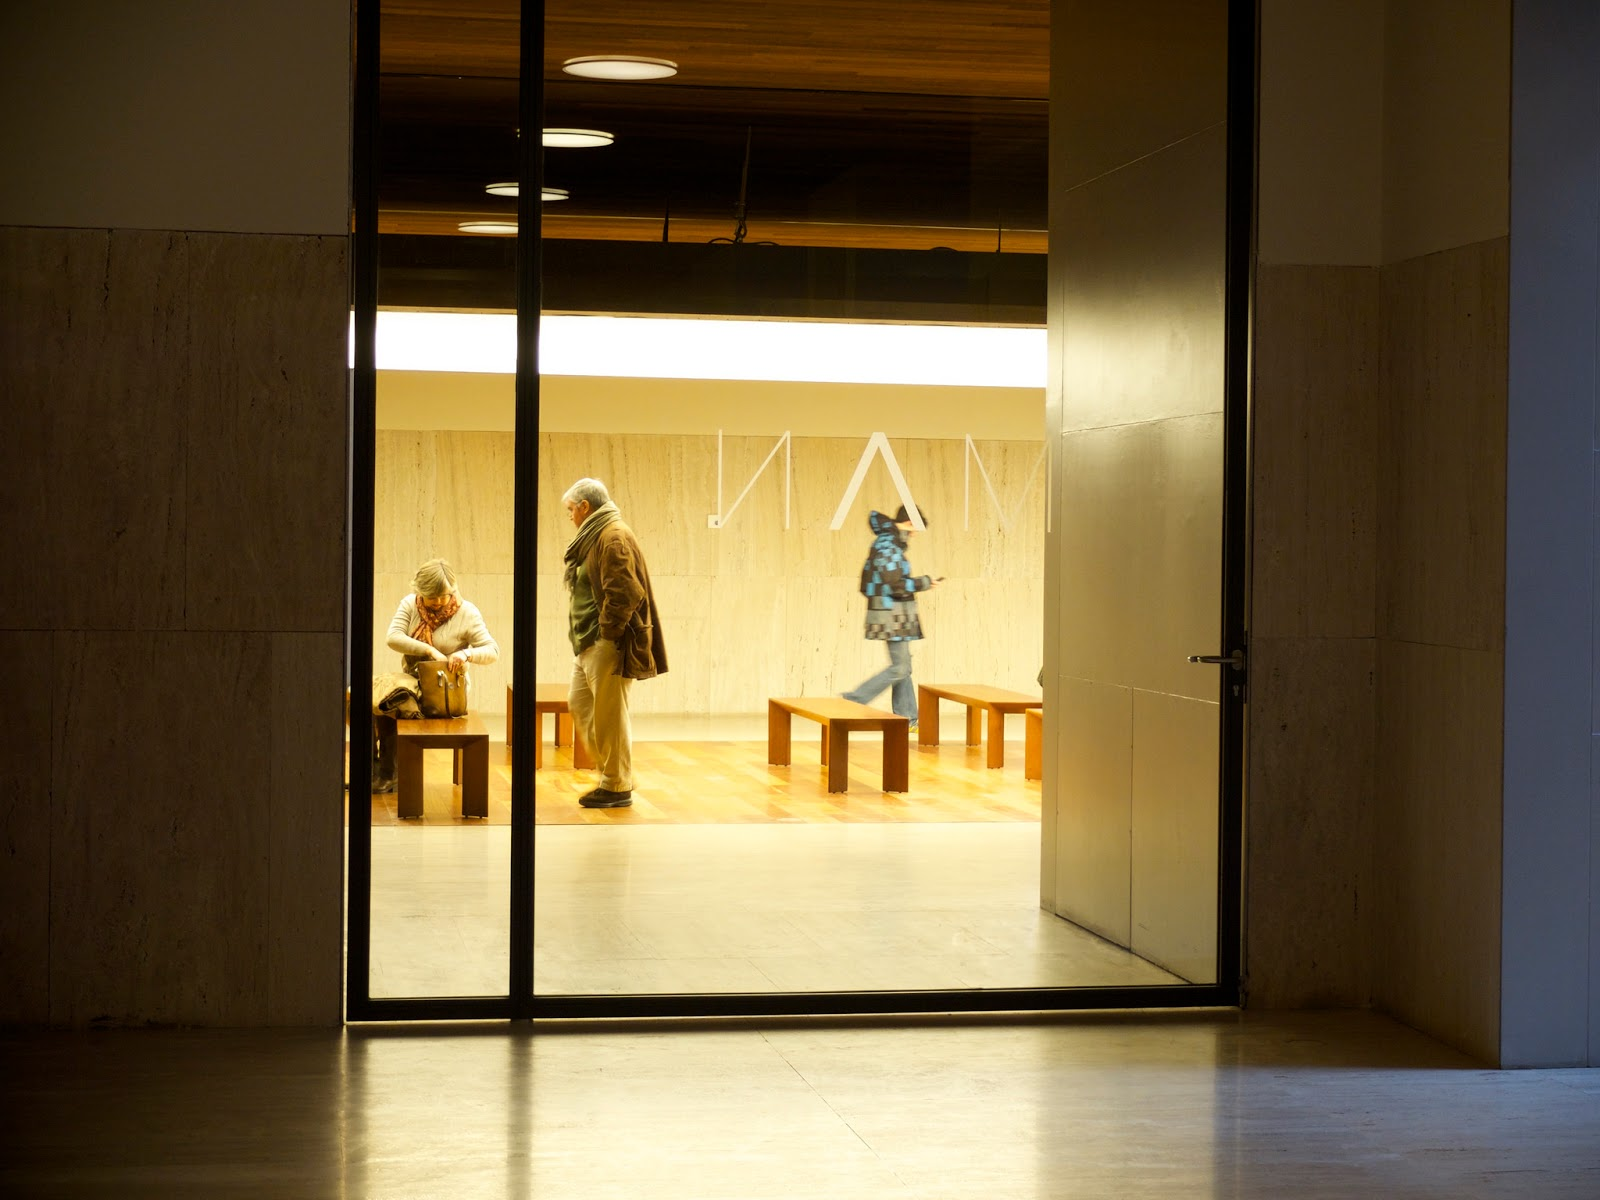 Museo Arqueológico Nacional, Madrid 2015